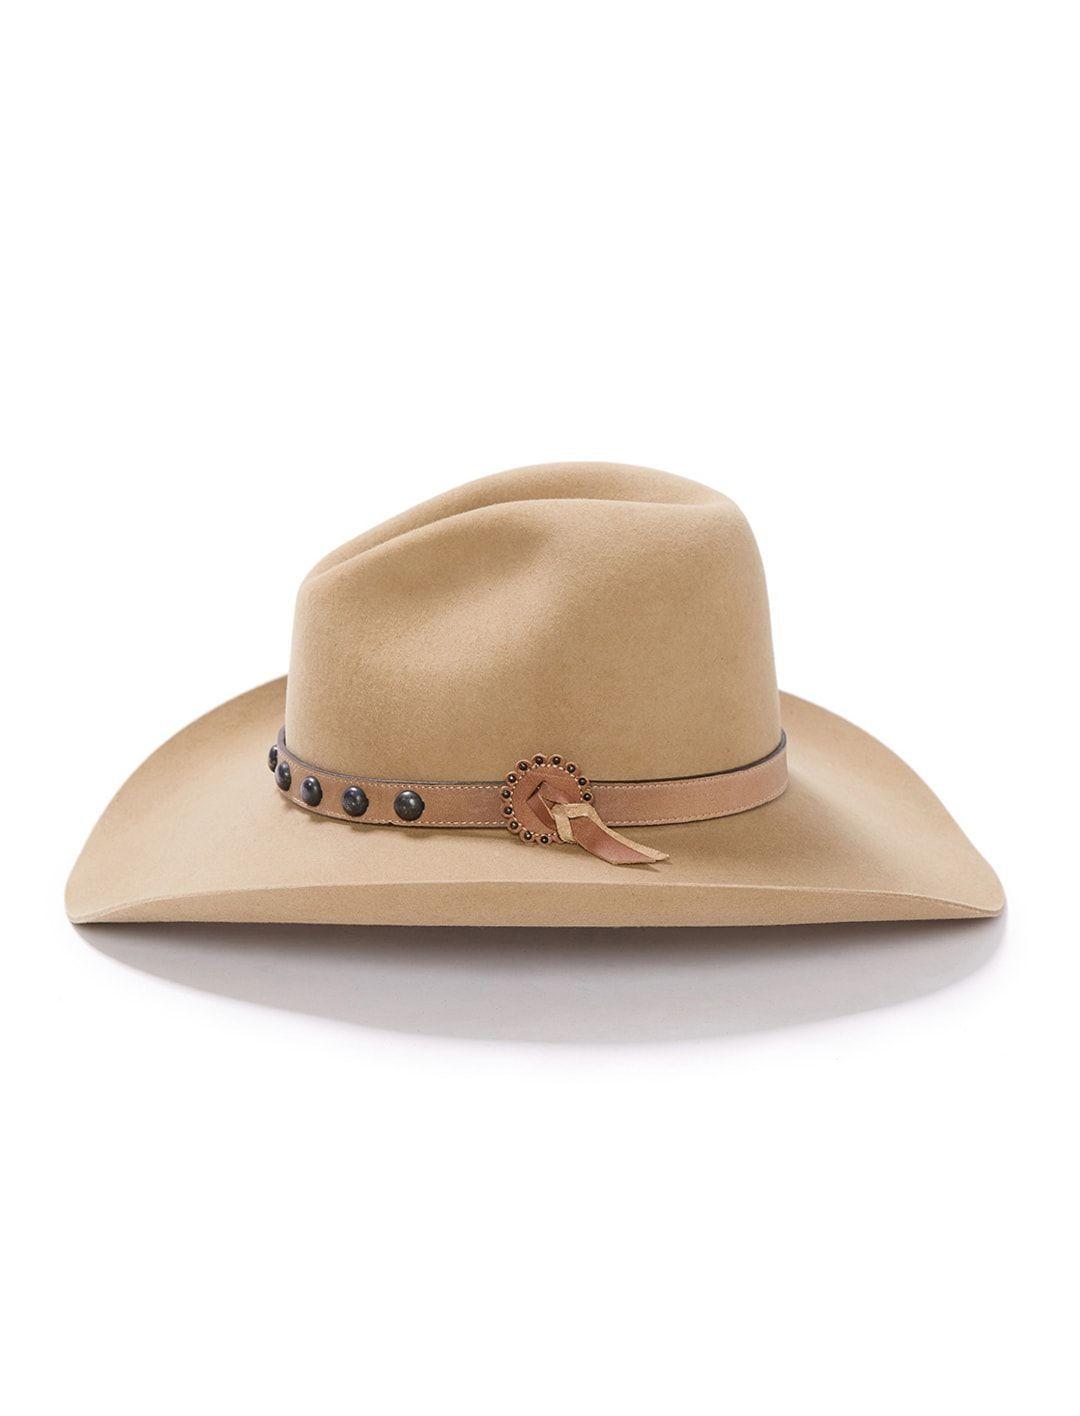 Stetson Broken Bow 4x Cowboy Hat Leather Cowboy Hats Cowboy Hat Styles Cowboy Hats